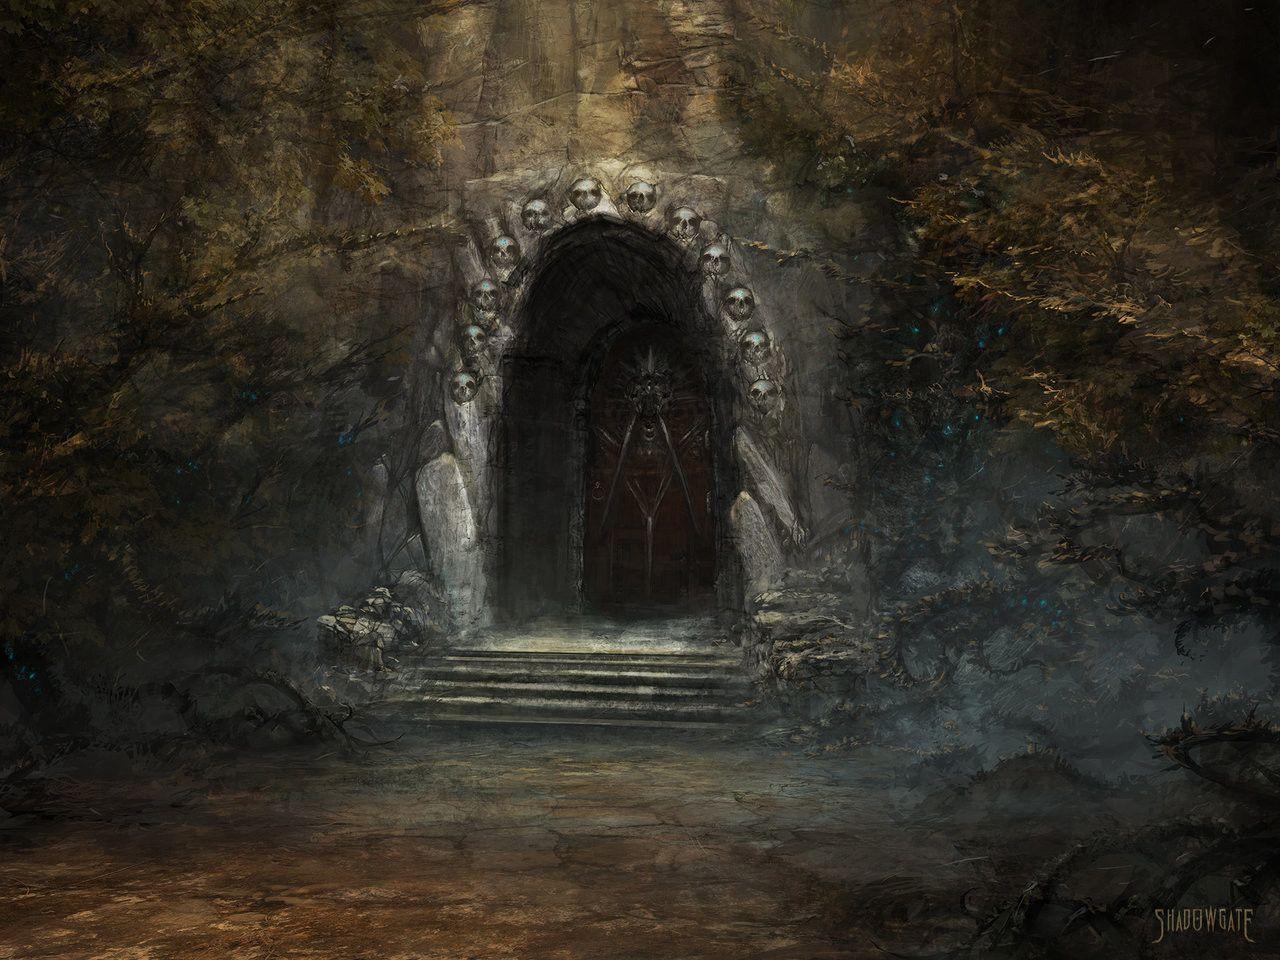 Shadowgate, Chris Cold on ArtStation at https://www.artstation.com/artwork/N4Ol1